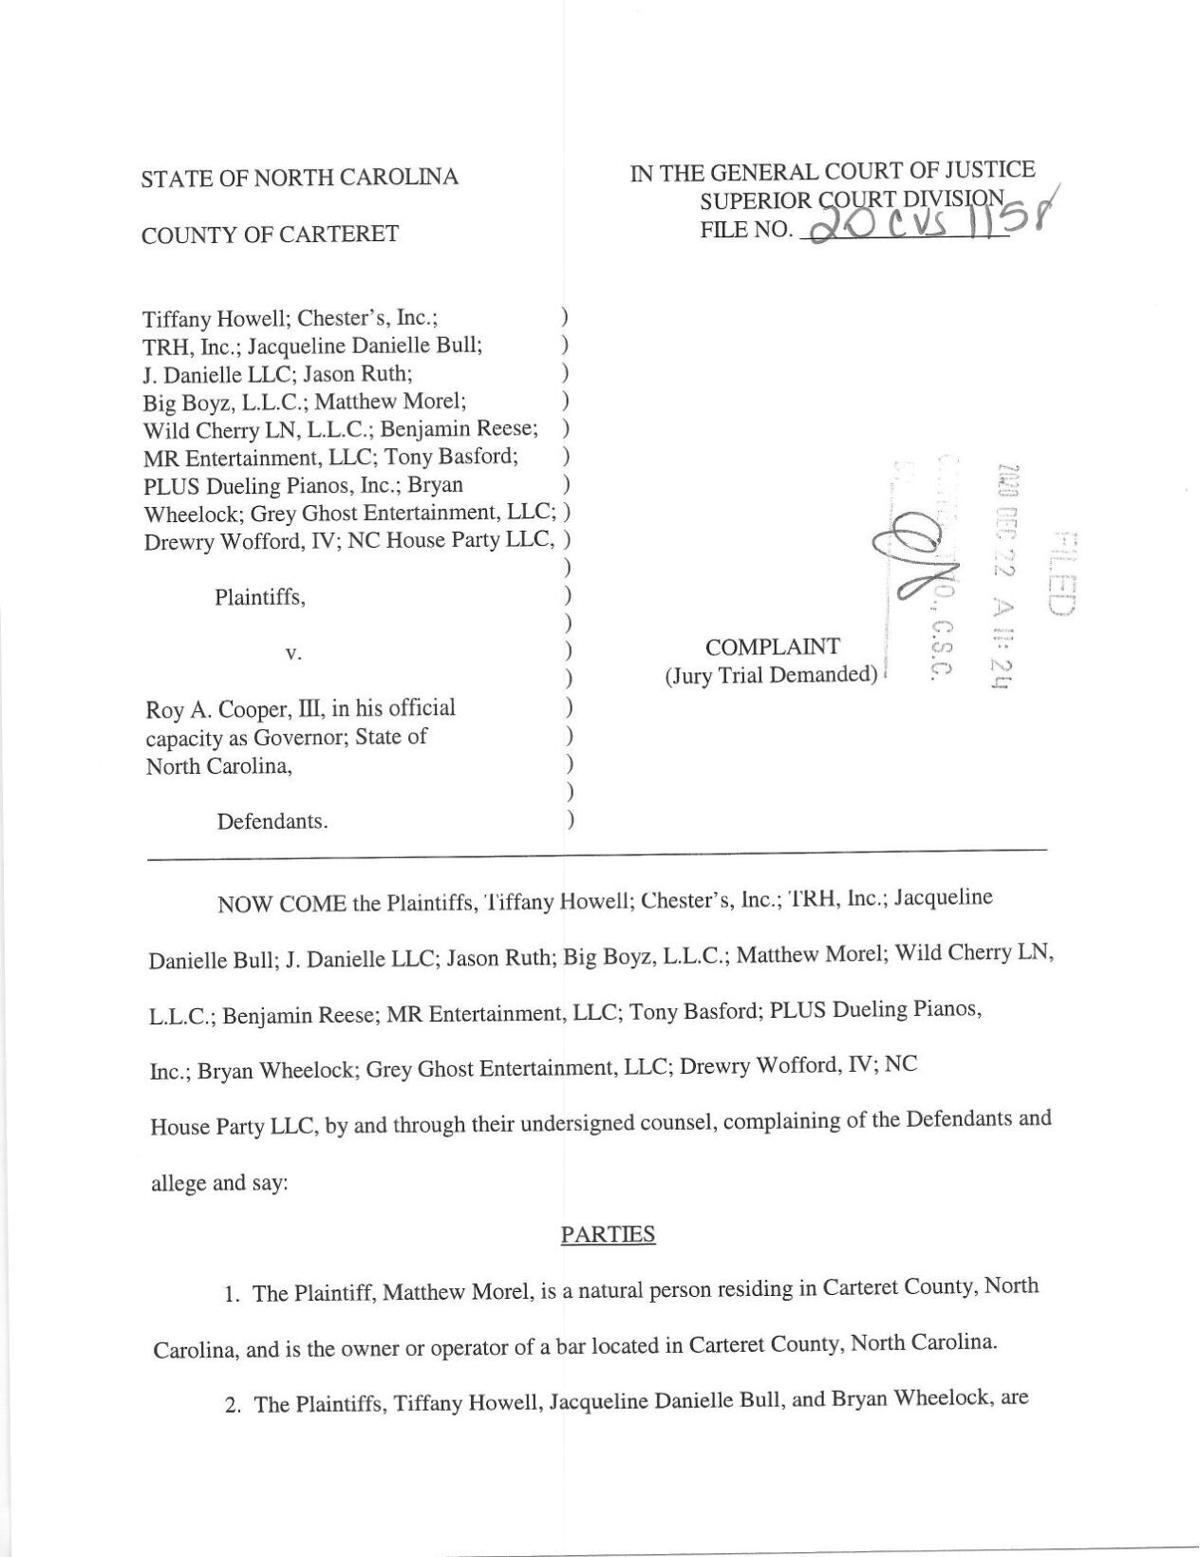 NCBOA lawsuit vs. Cooper